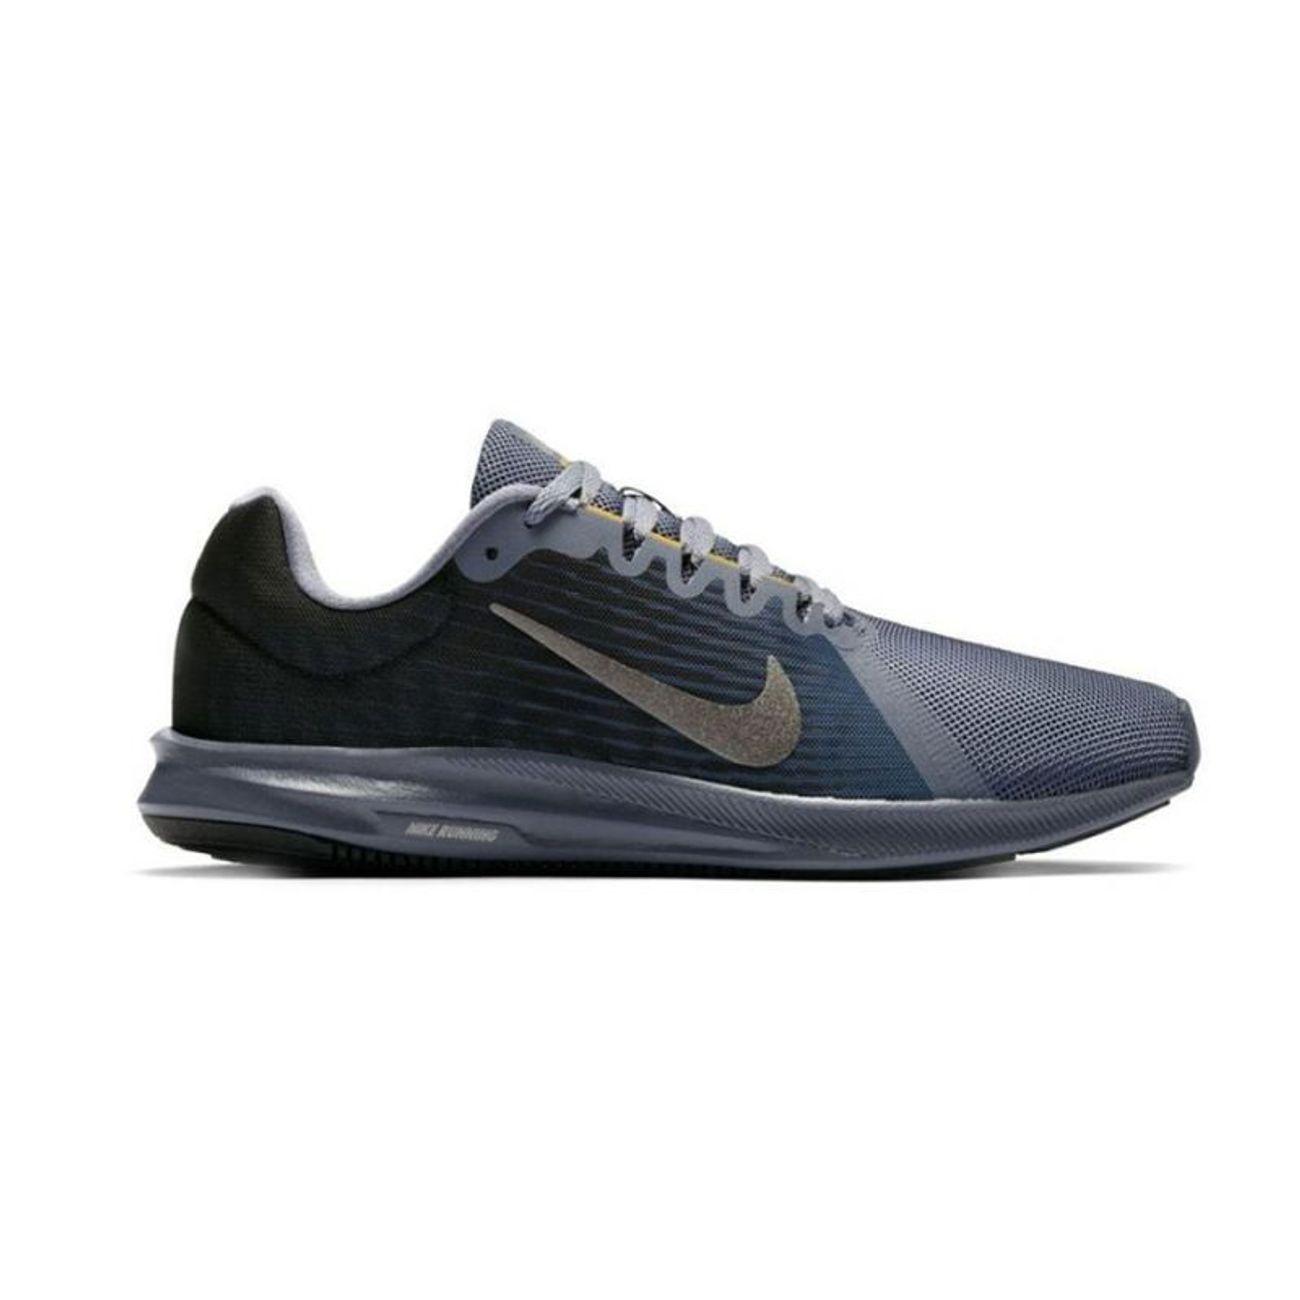 Running 011 Gris Adulte Noir Ni908984 Nike Downshifter 8 qAc35S4RjL